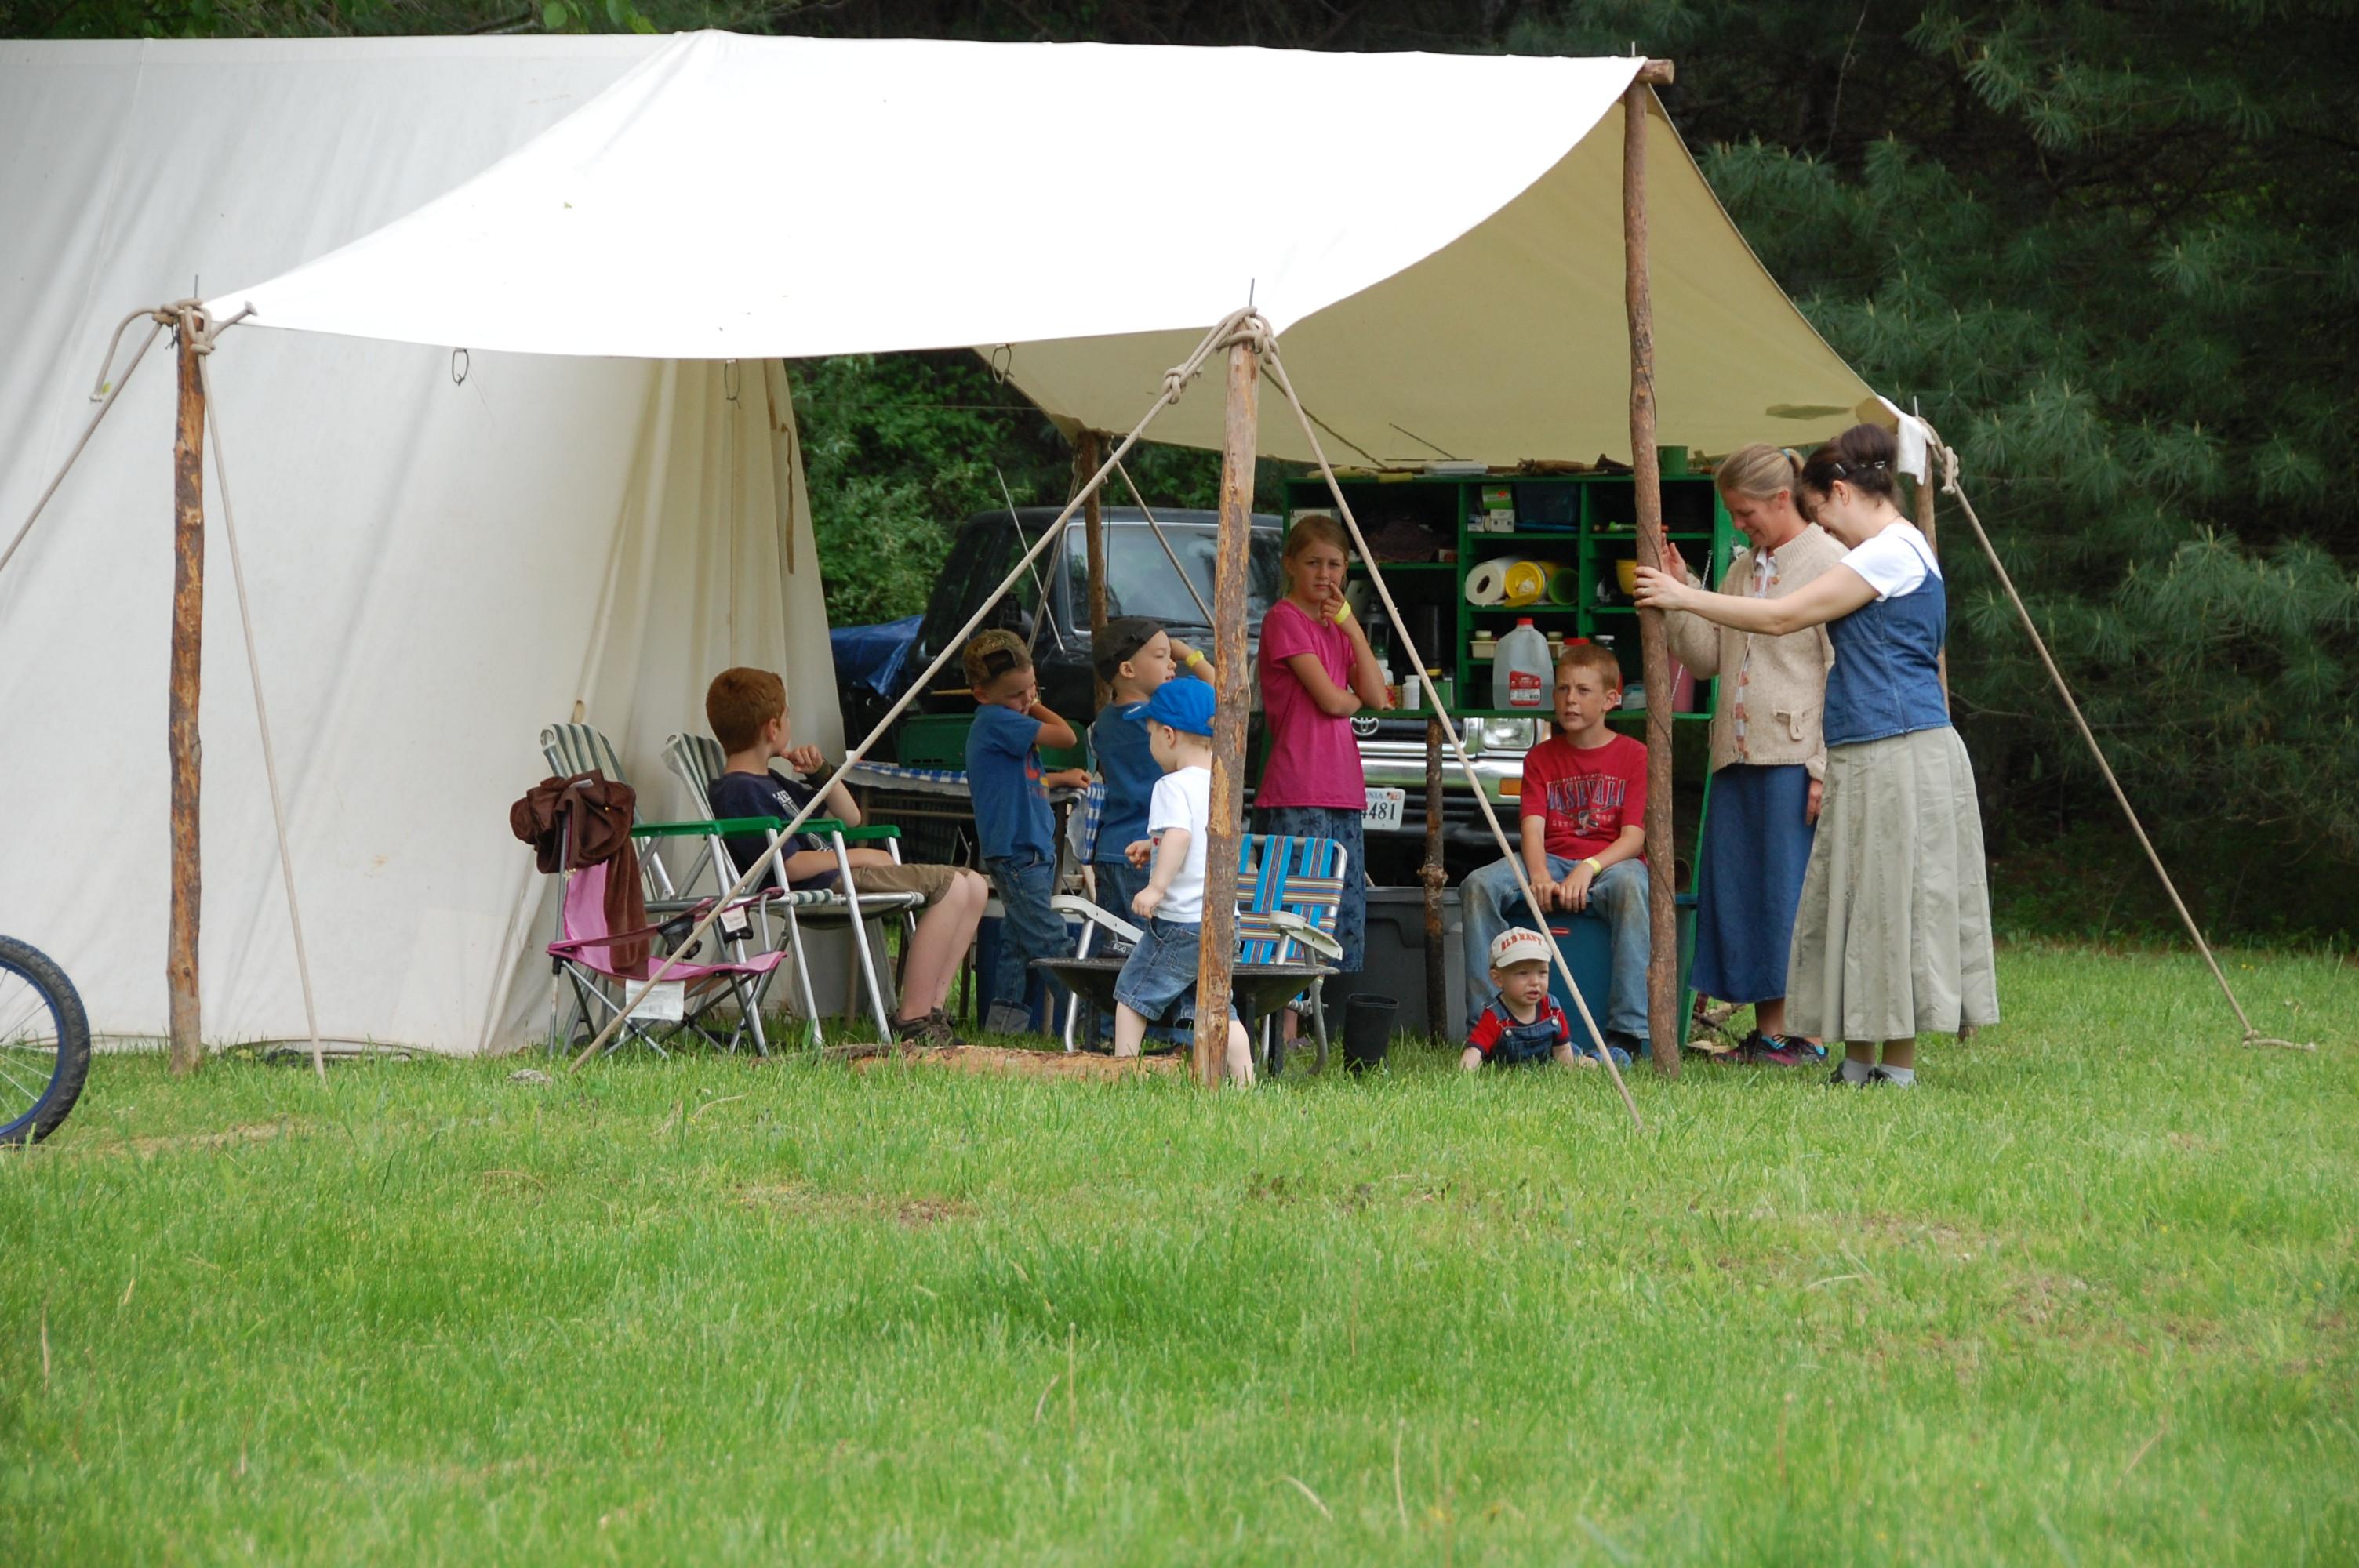 Matt & Amy's campsite